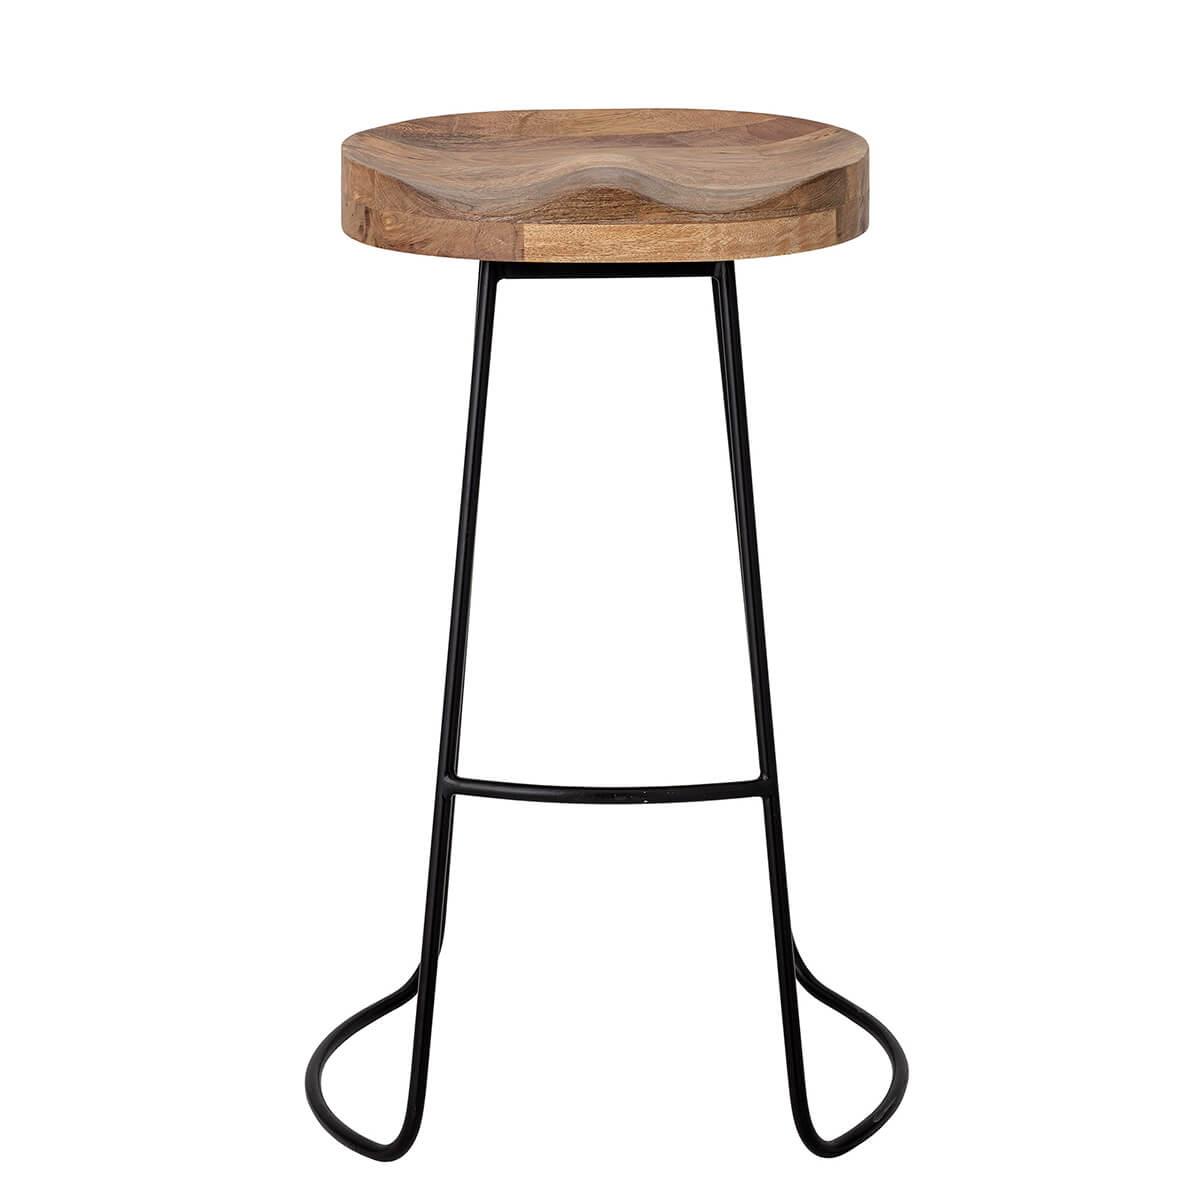 Bárszék mangófából elegáns skandináv bútor